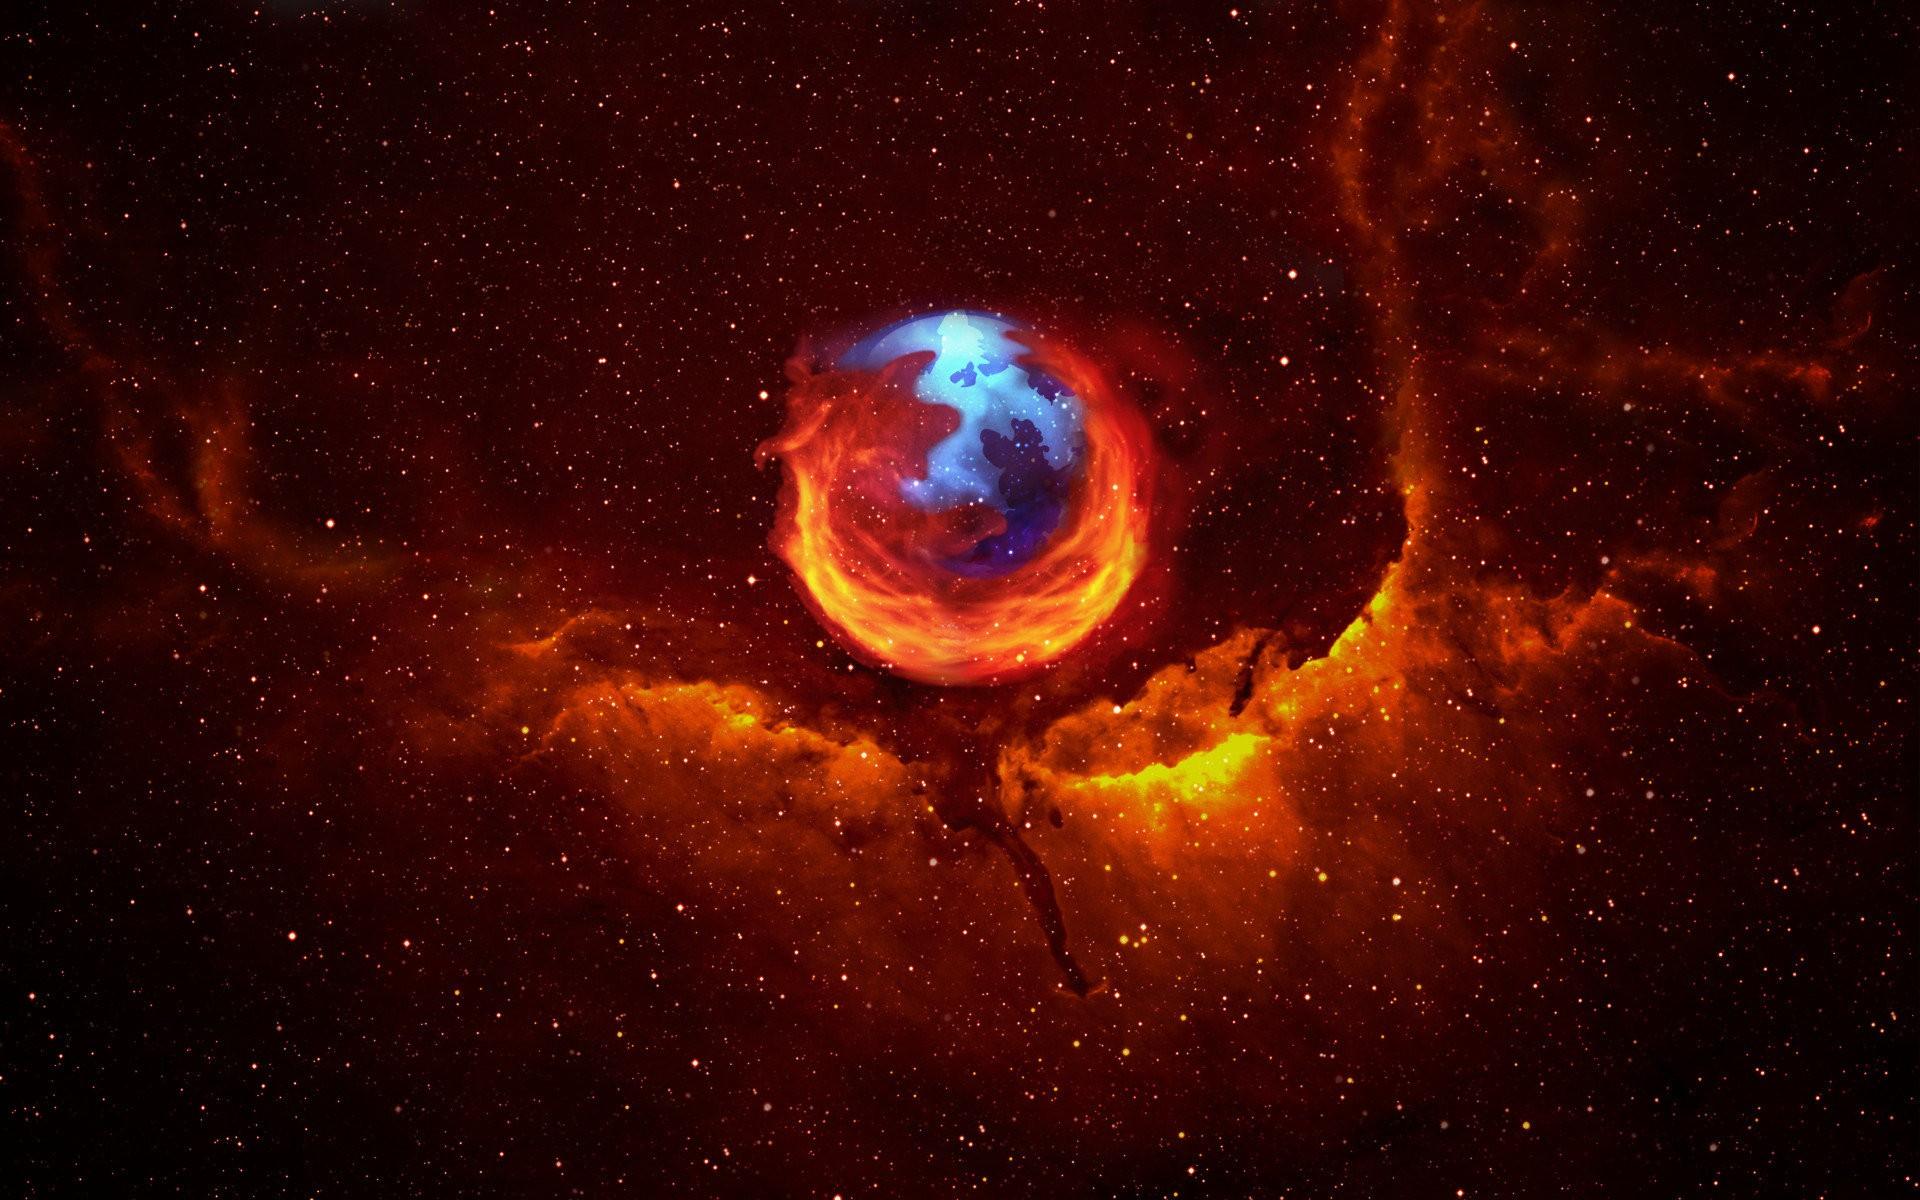 wallpaper : internet, nebula, atmosphere, universe, mozilla firefox